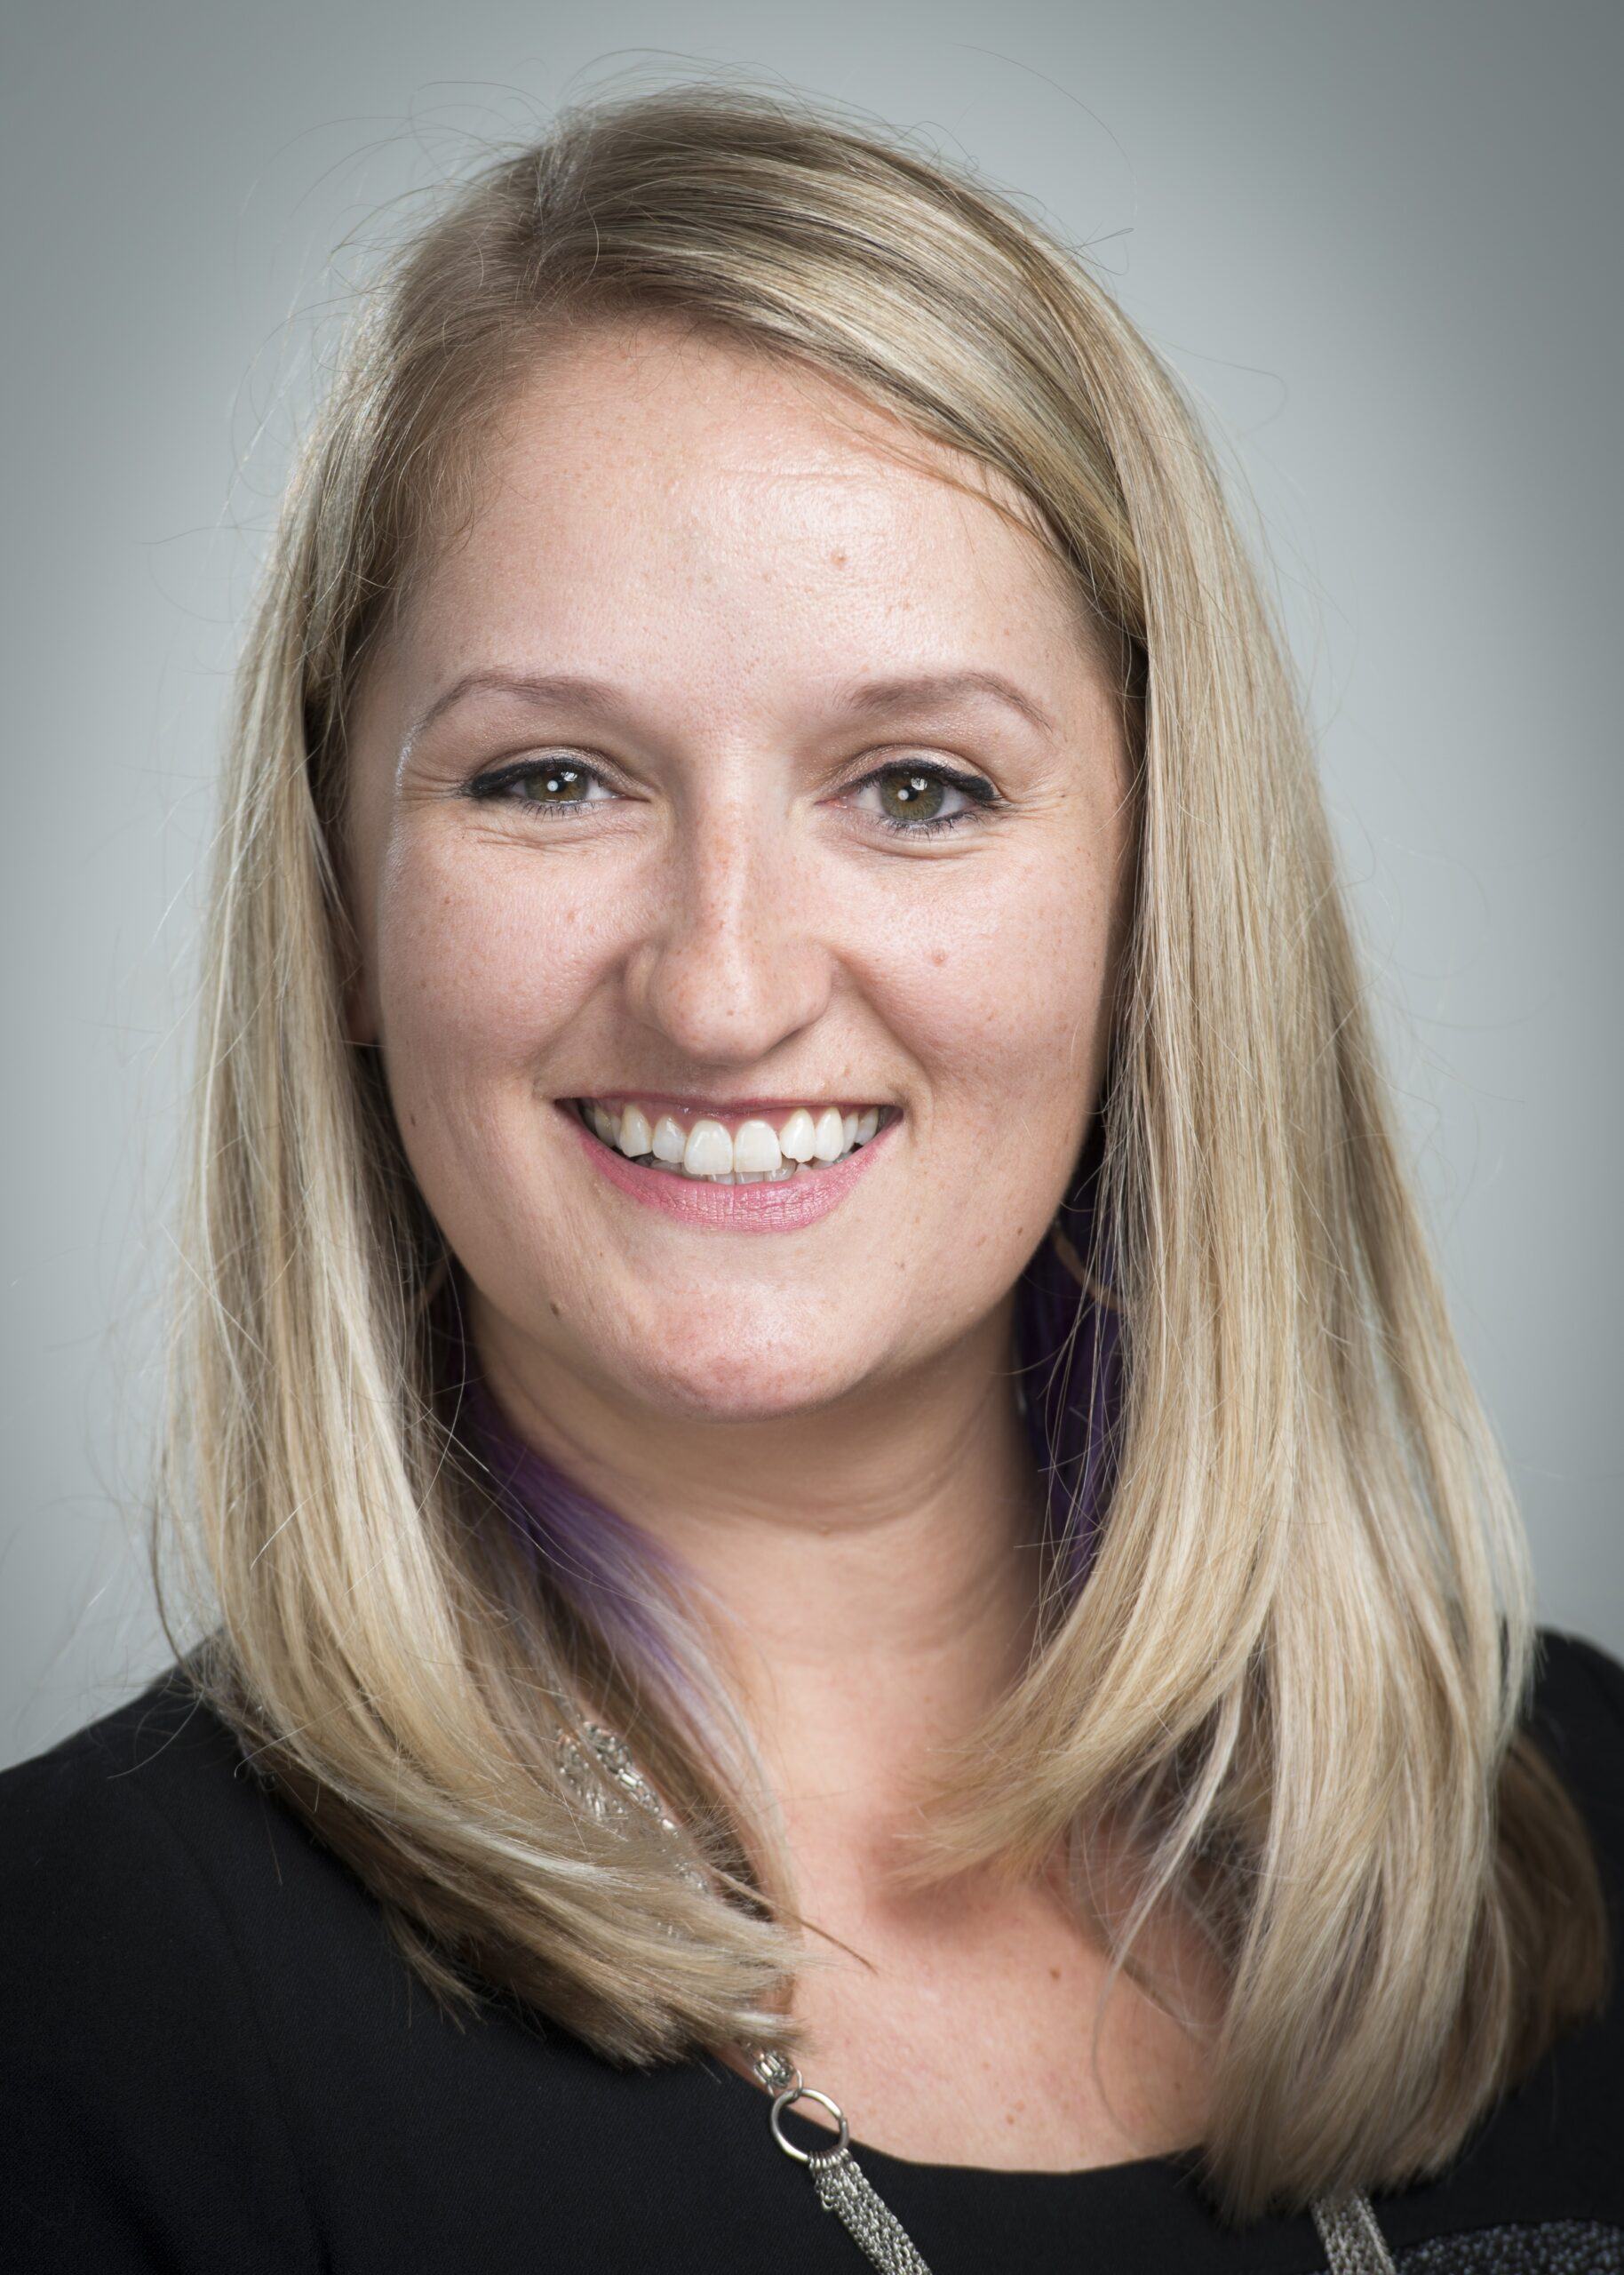 Kelly Farquharson headshot